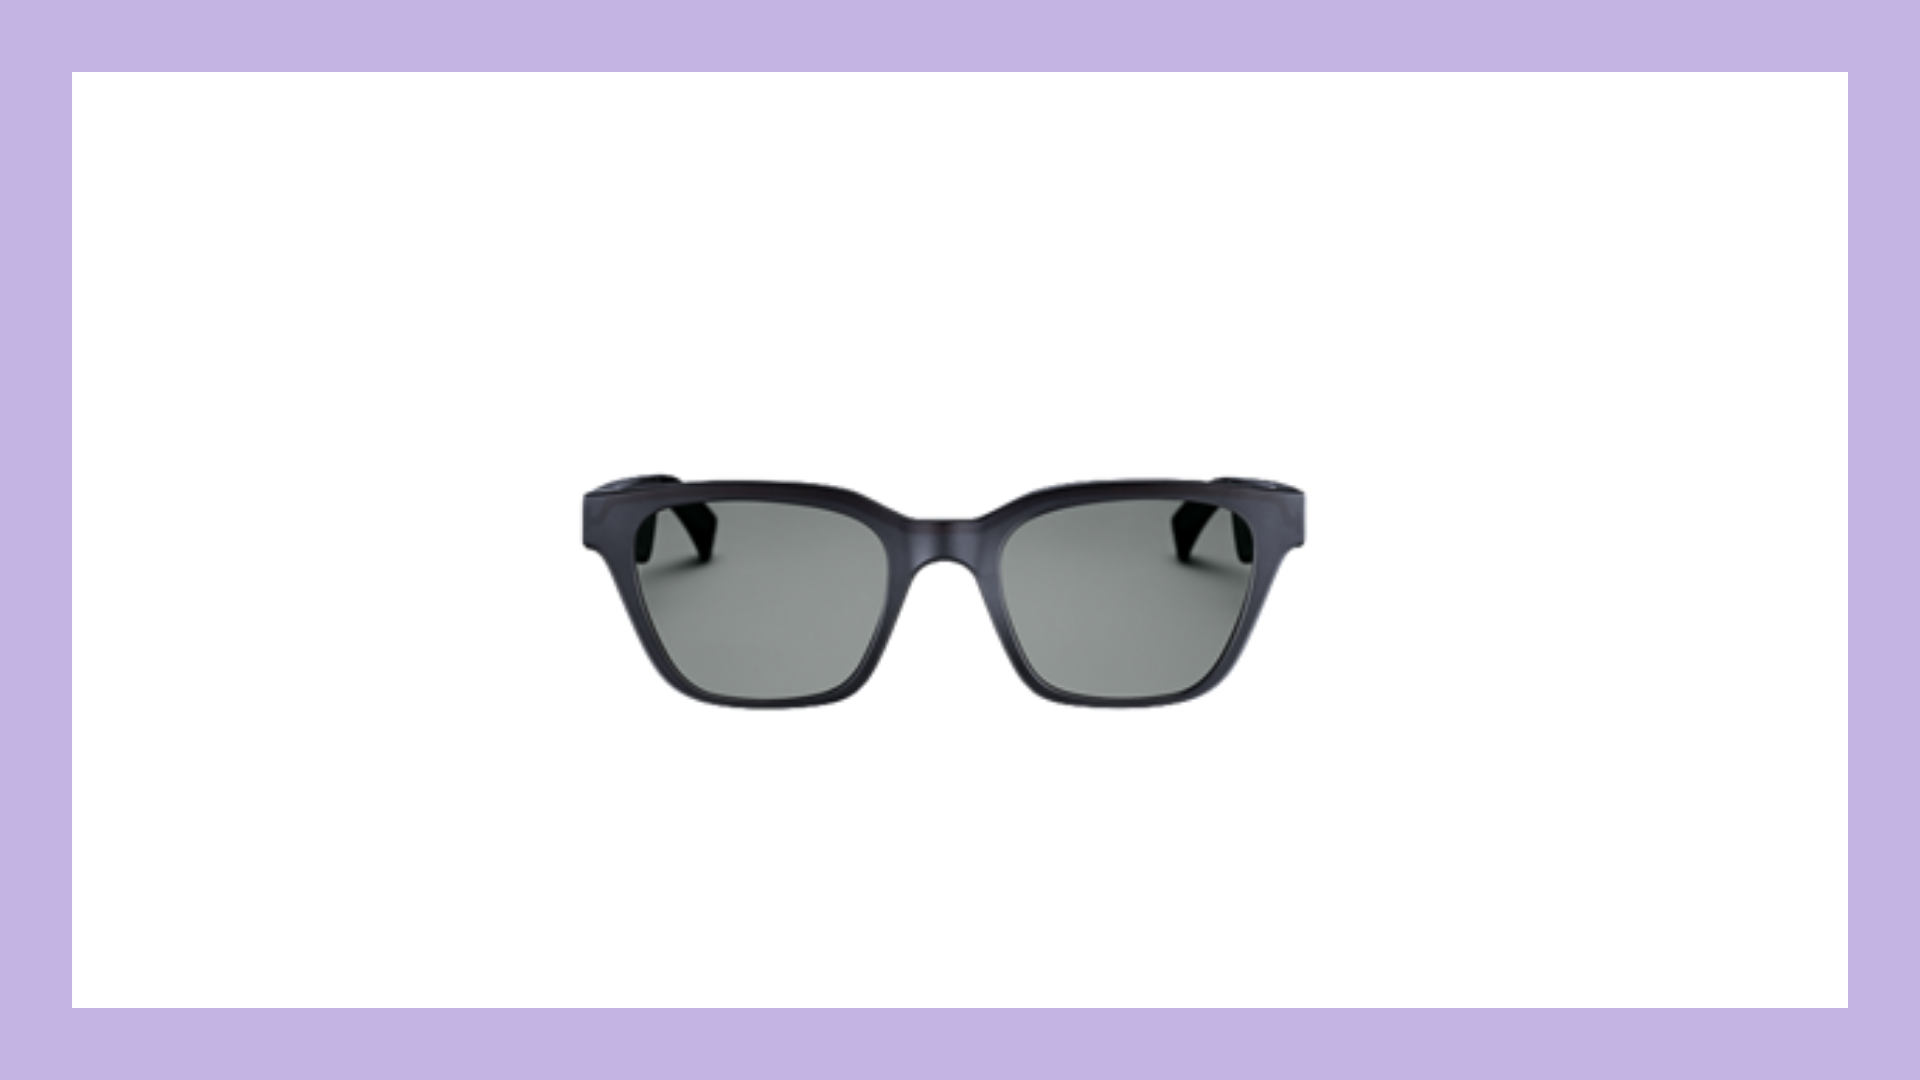 tech gifts for women sunglasses